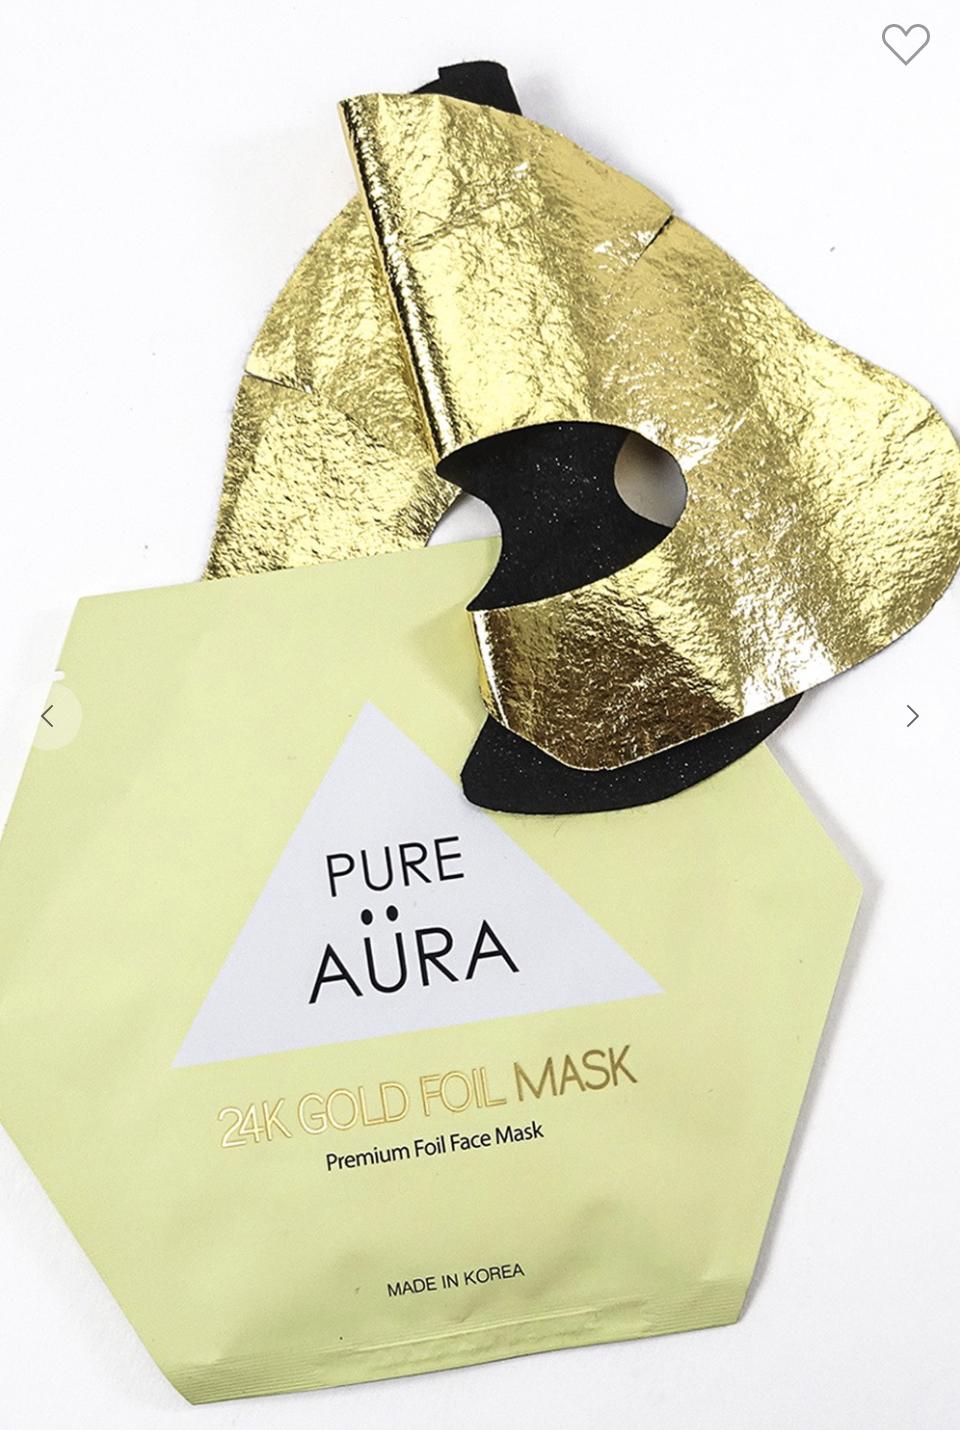 24K Gold Metallic Foil Mask